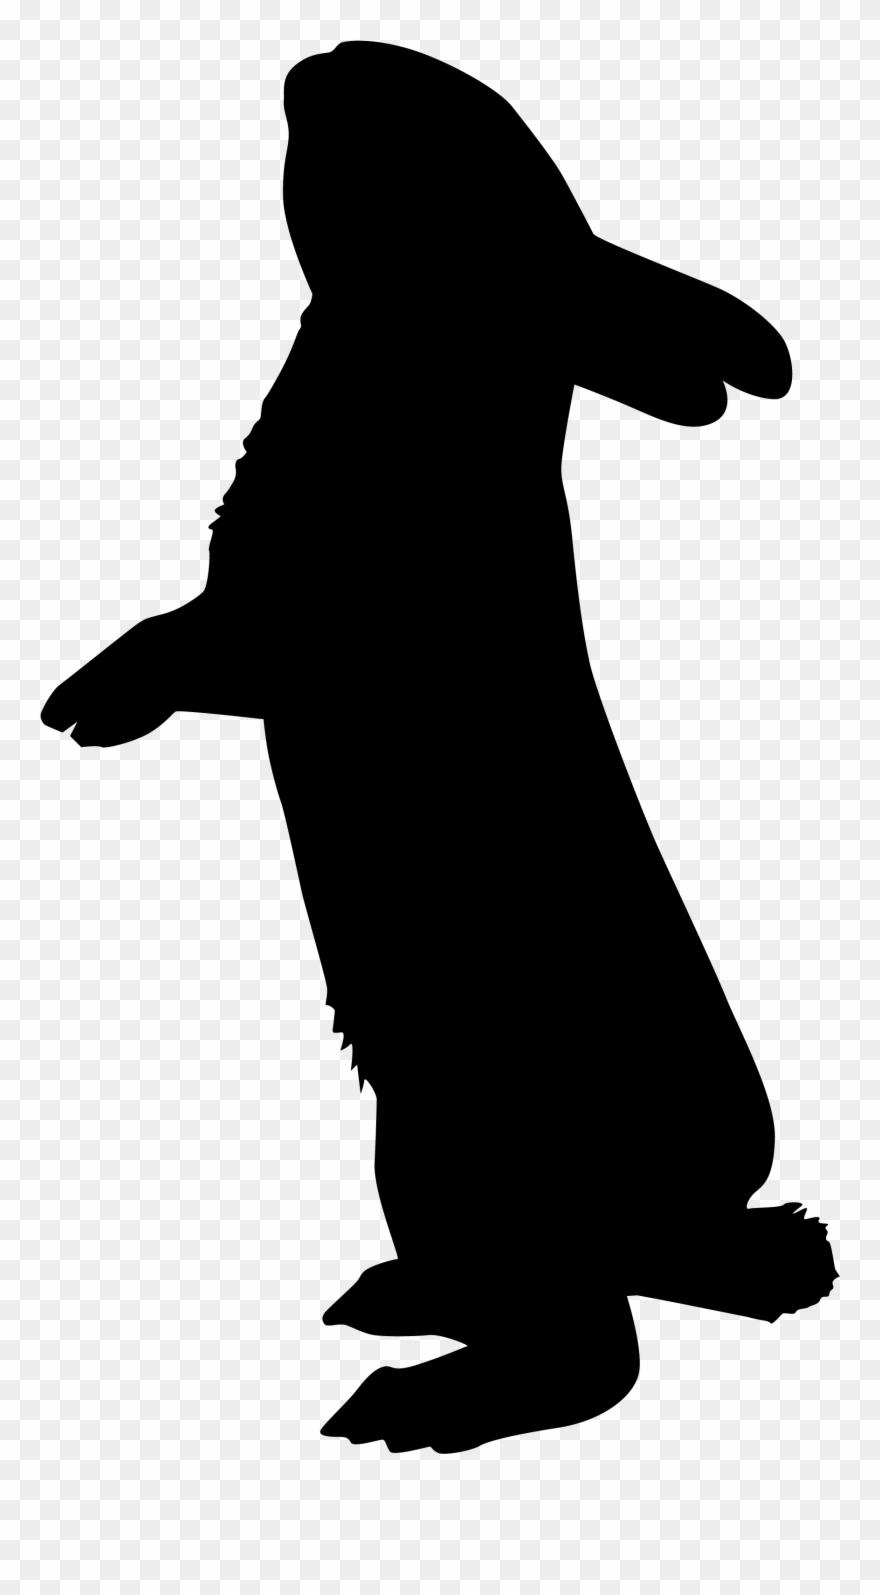 Recherche Google Rabbit Silhouette, Silhouette Art, - Rabbit Silhouette Png Clipart